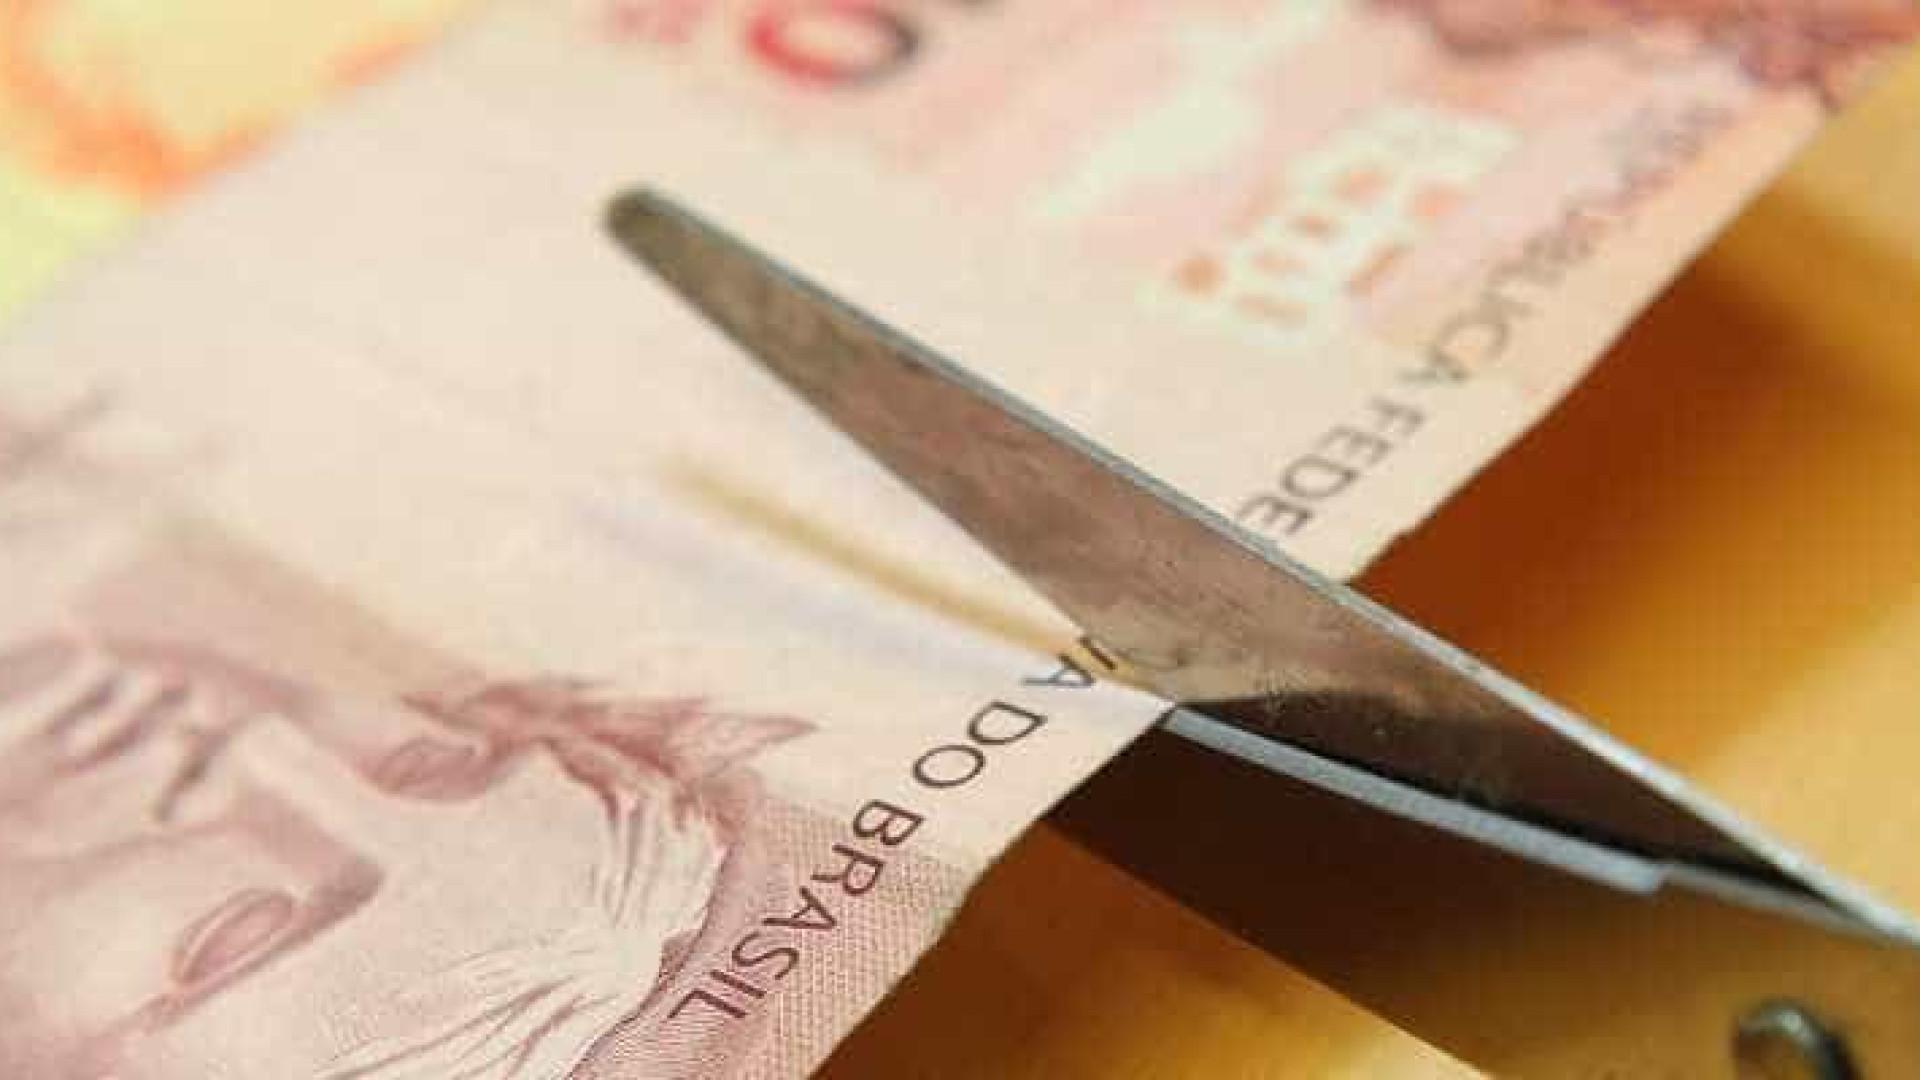 Comissão aprova projeto que torna crime alterar meta fiscal no 2º semestre